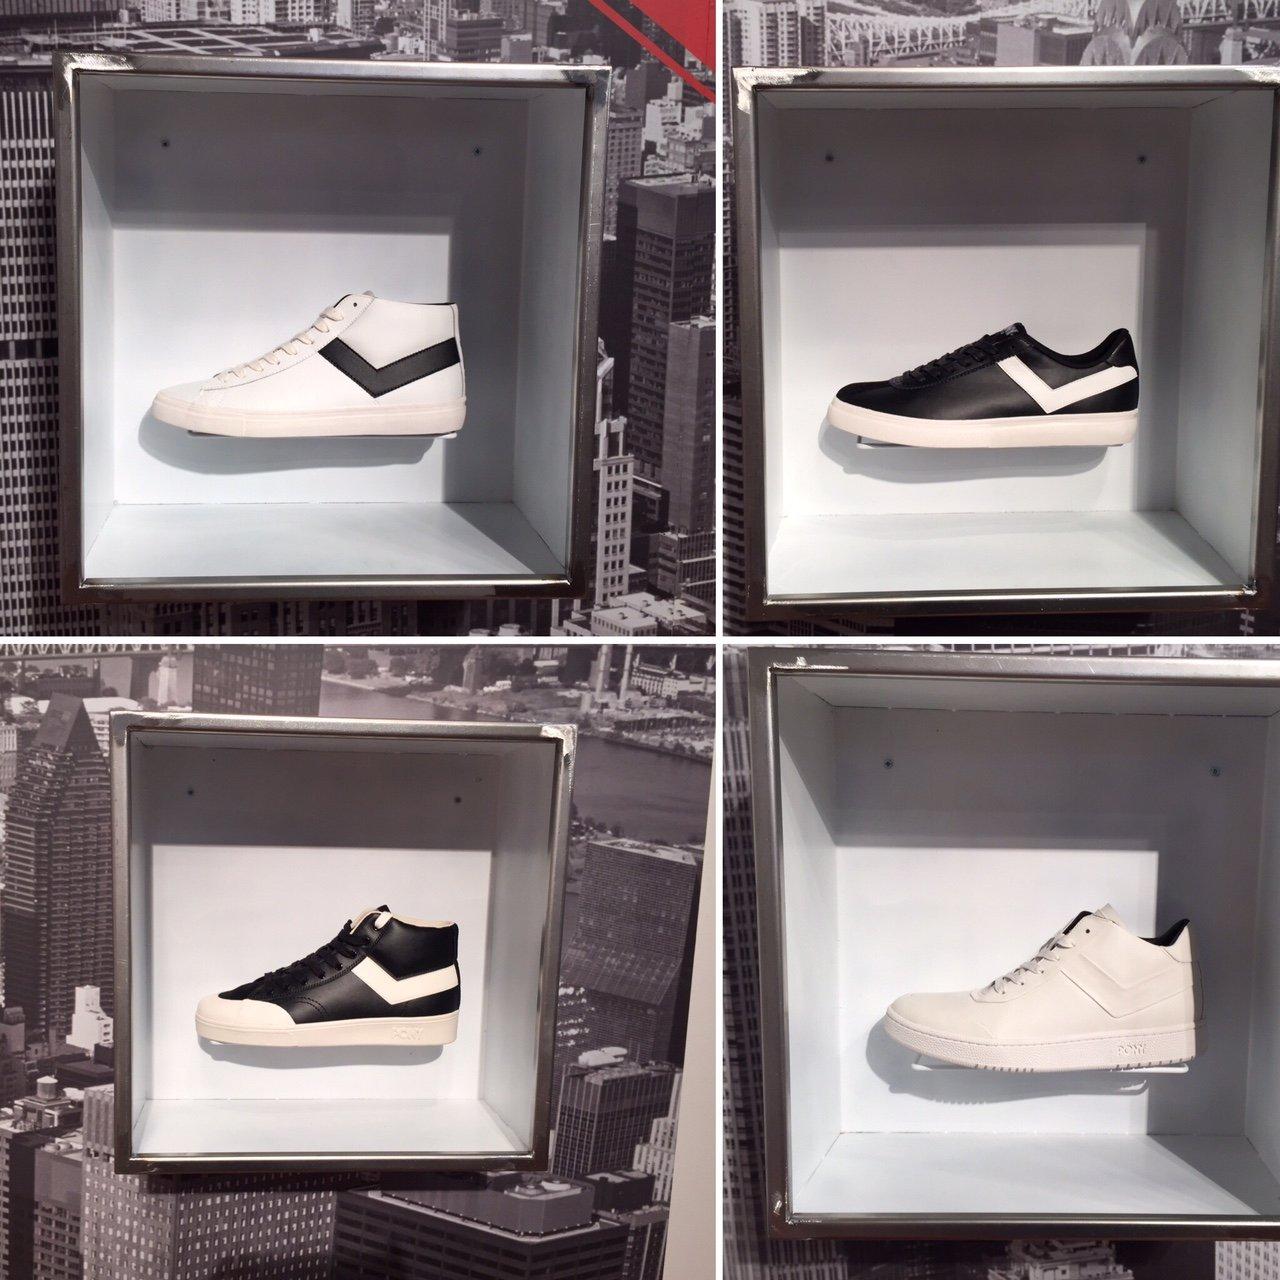 Moda uomo 2016-2017: le sneakers